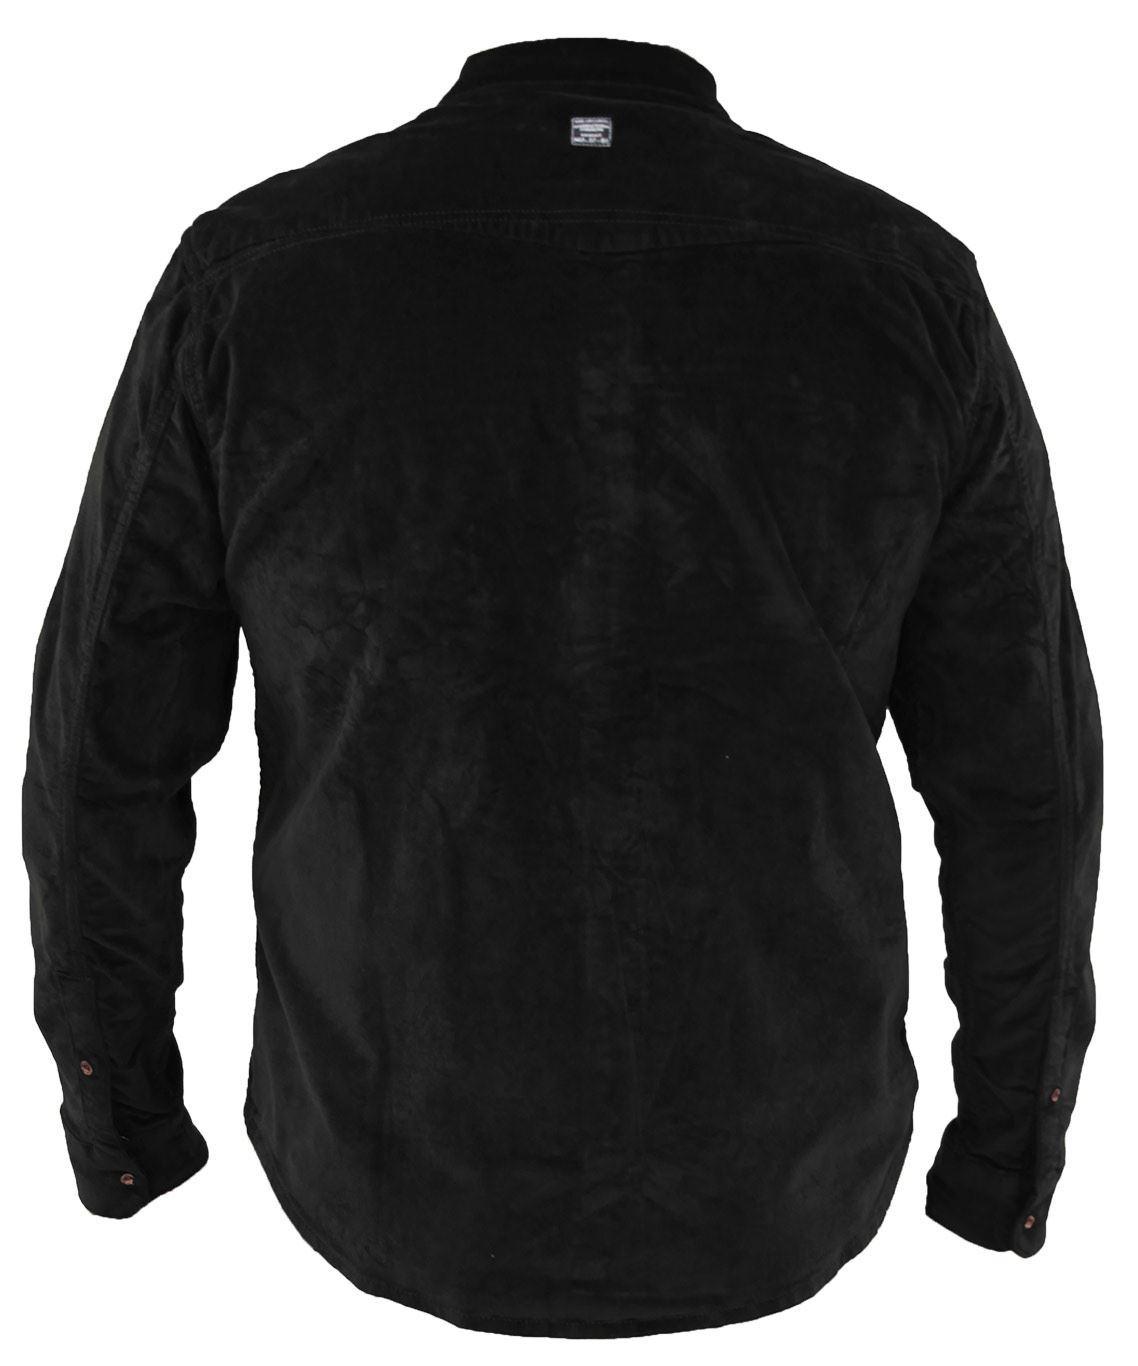 Mens-Corduroy-Cotton-Shirt-Long-Sleeve-Casual-Shirts-Jacksouth-Jacket-Top-S-2XL thumbnail 18